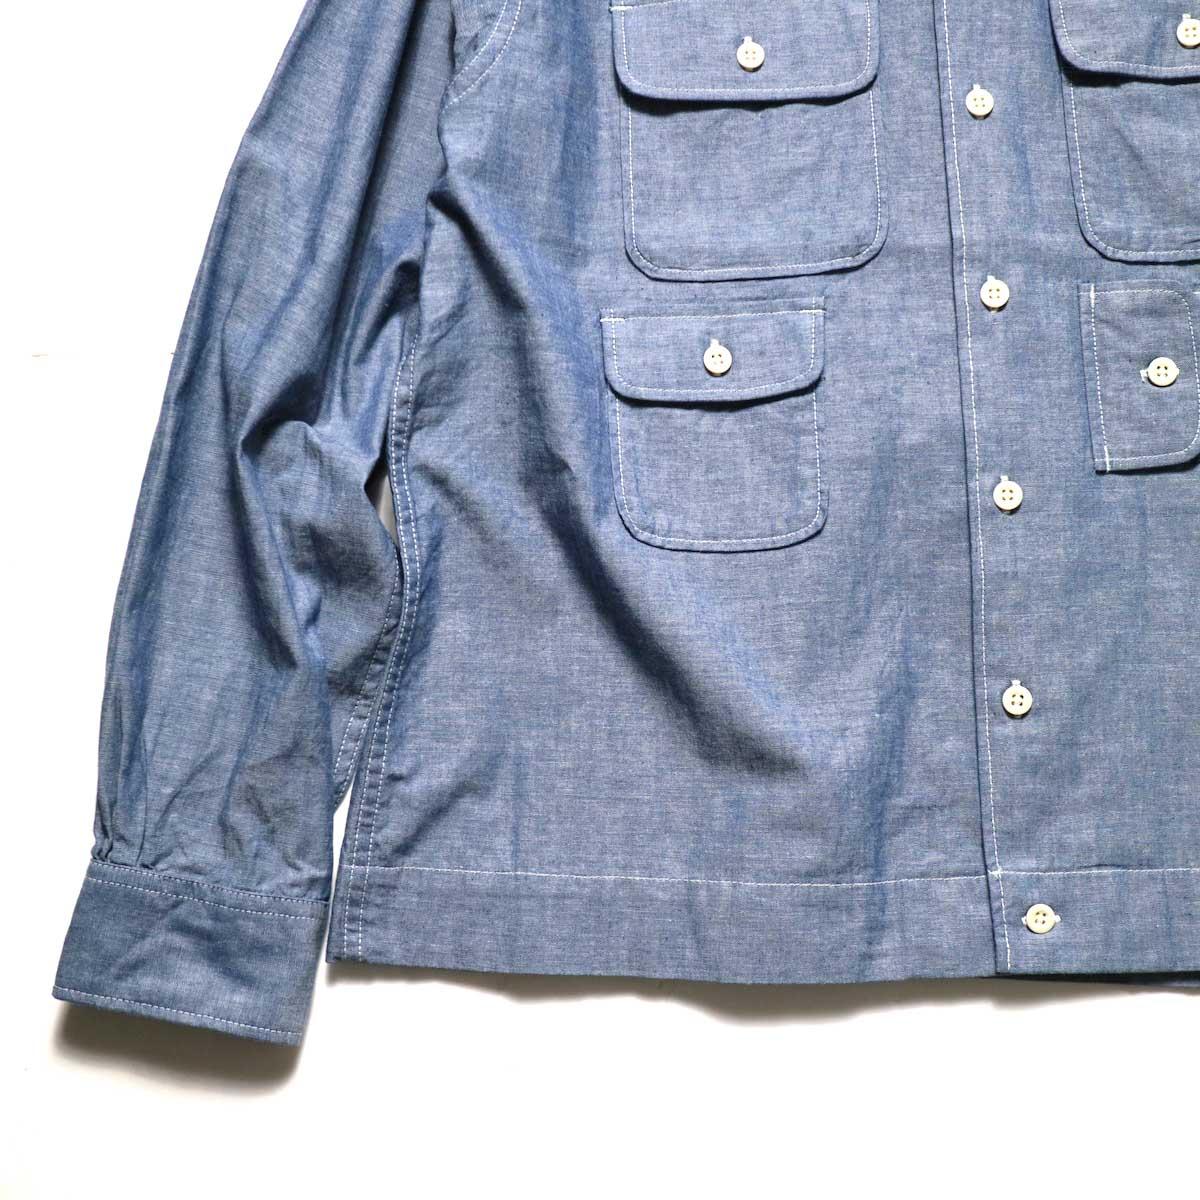 Engineered Garments / Bowling Shirt-Cotton Chambray (Blue)袖、裾